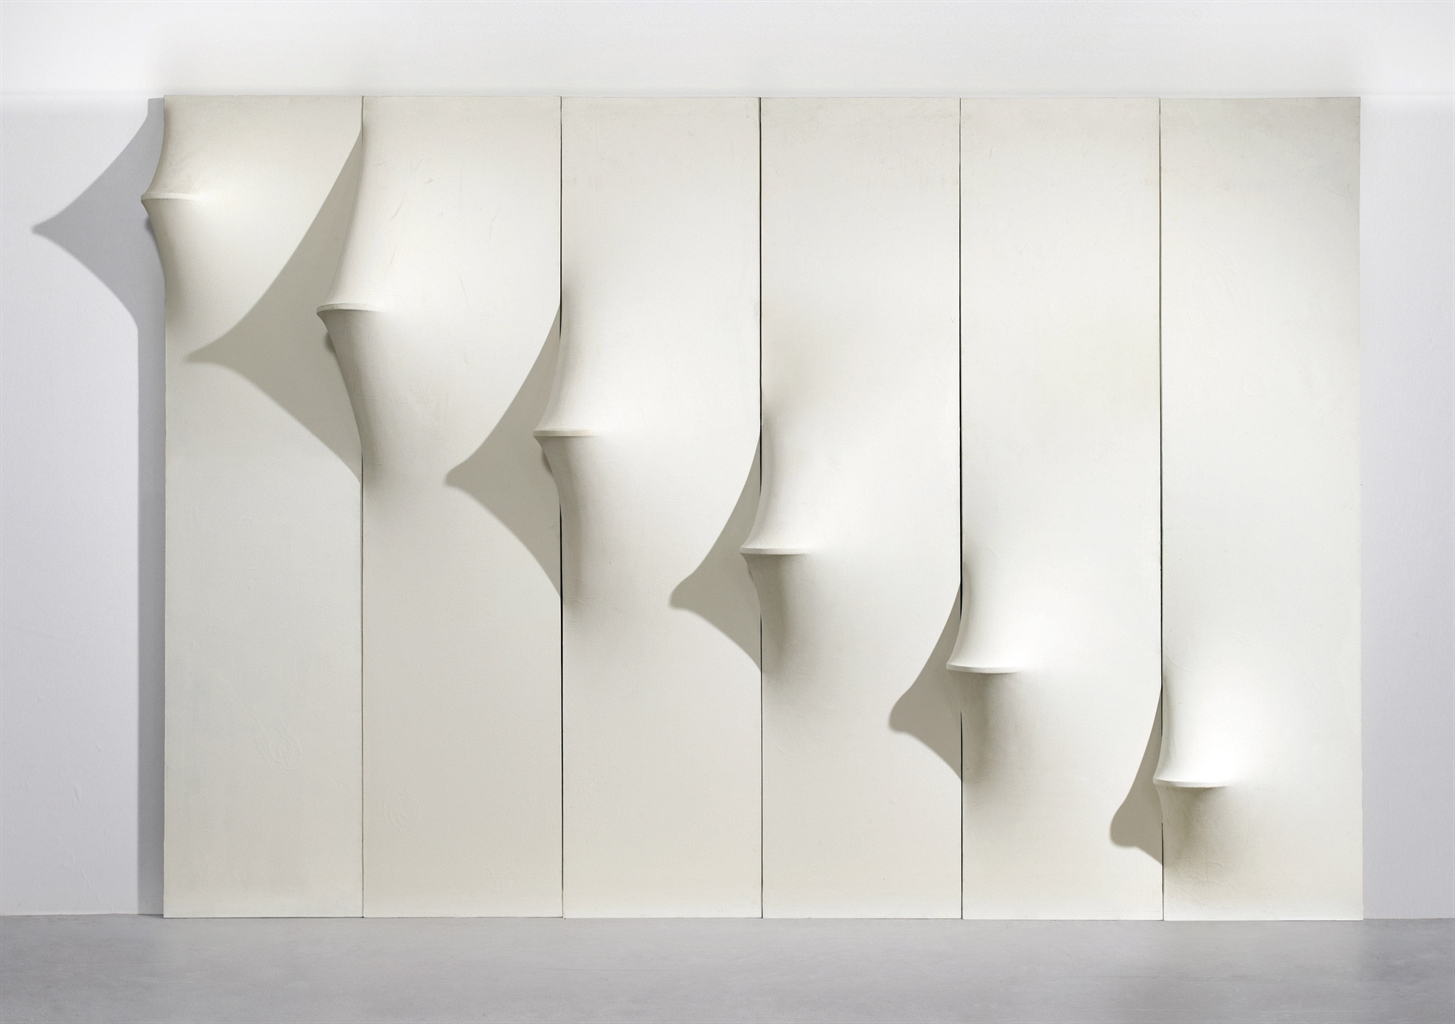 Agostino Bonalumi-Ambiente bianco (White Environment)-1967